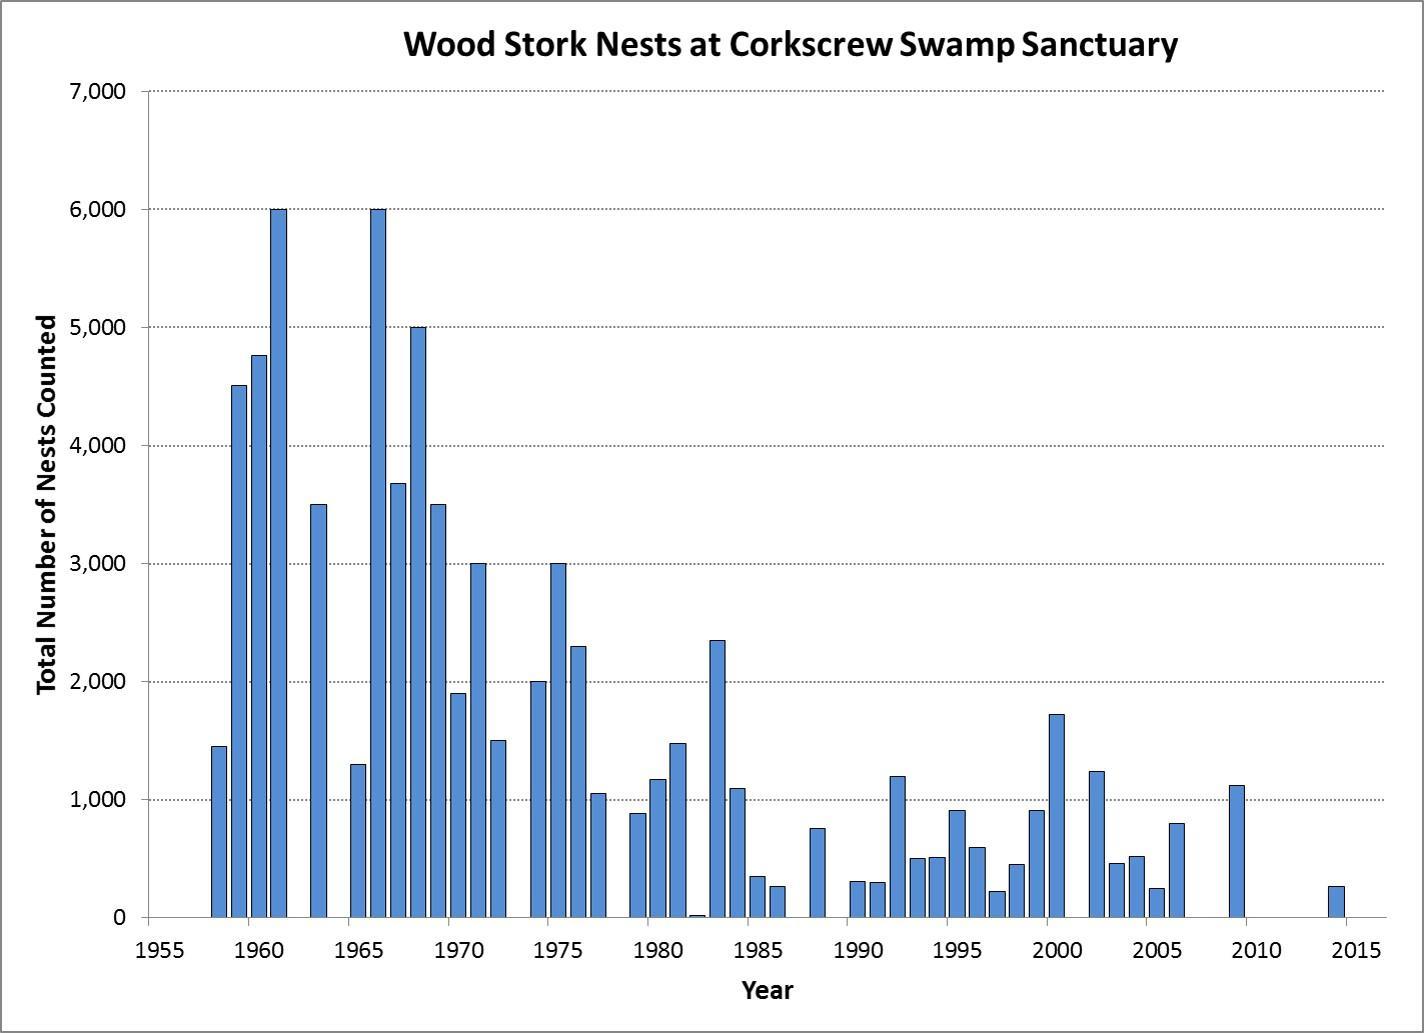 Graph of Wood Stork nesting effort at Corkscrew Swamp Sanctuary